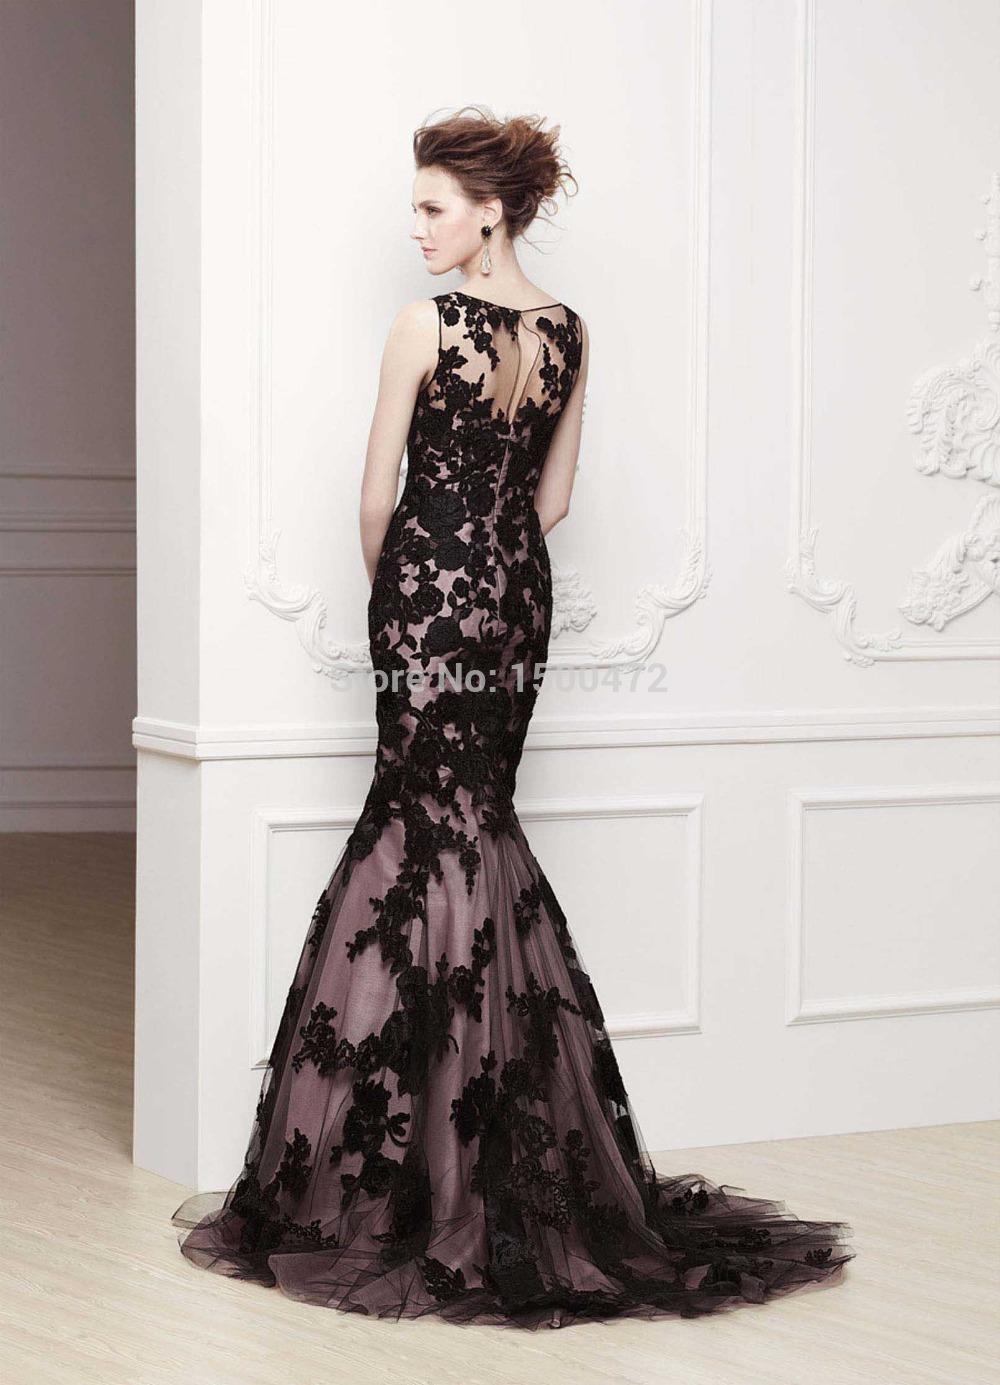 ee1379974 Elegante Piso Larga Noche de la Sirena Negro Vestidos para la velada ...